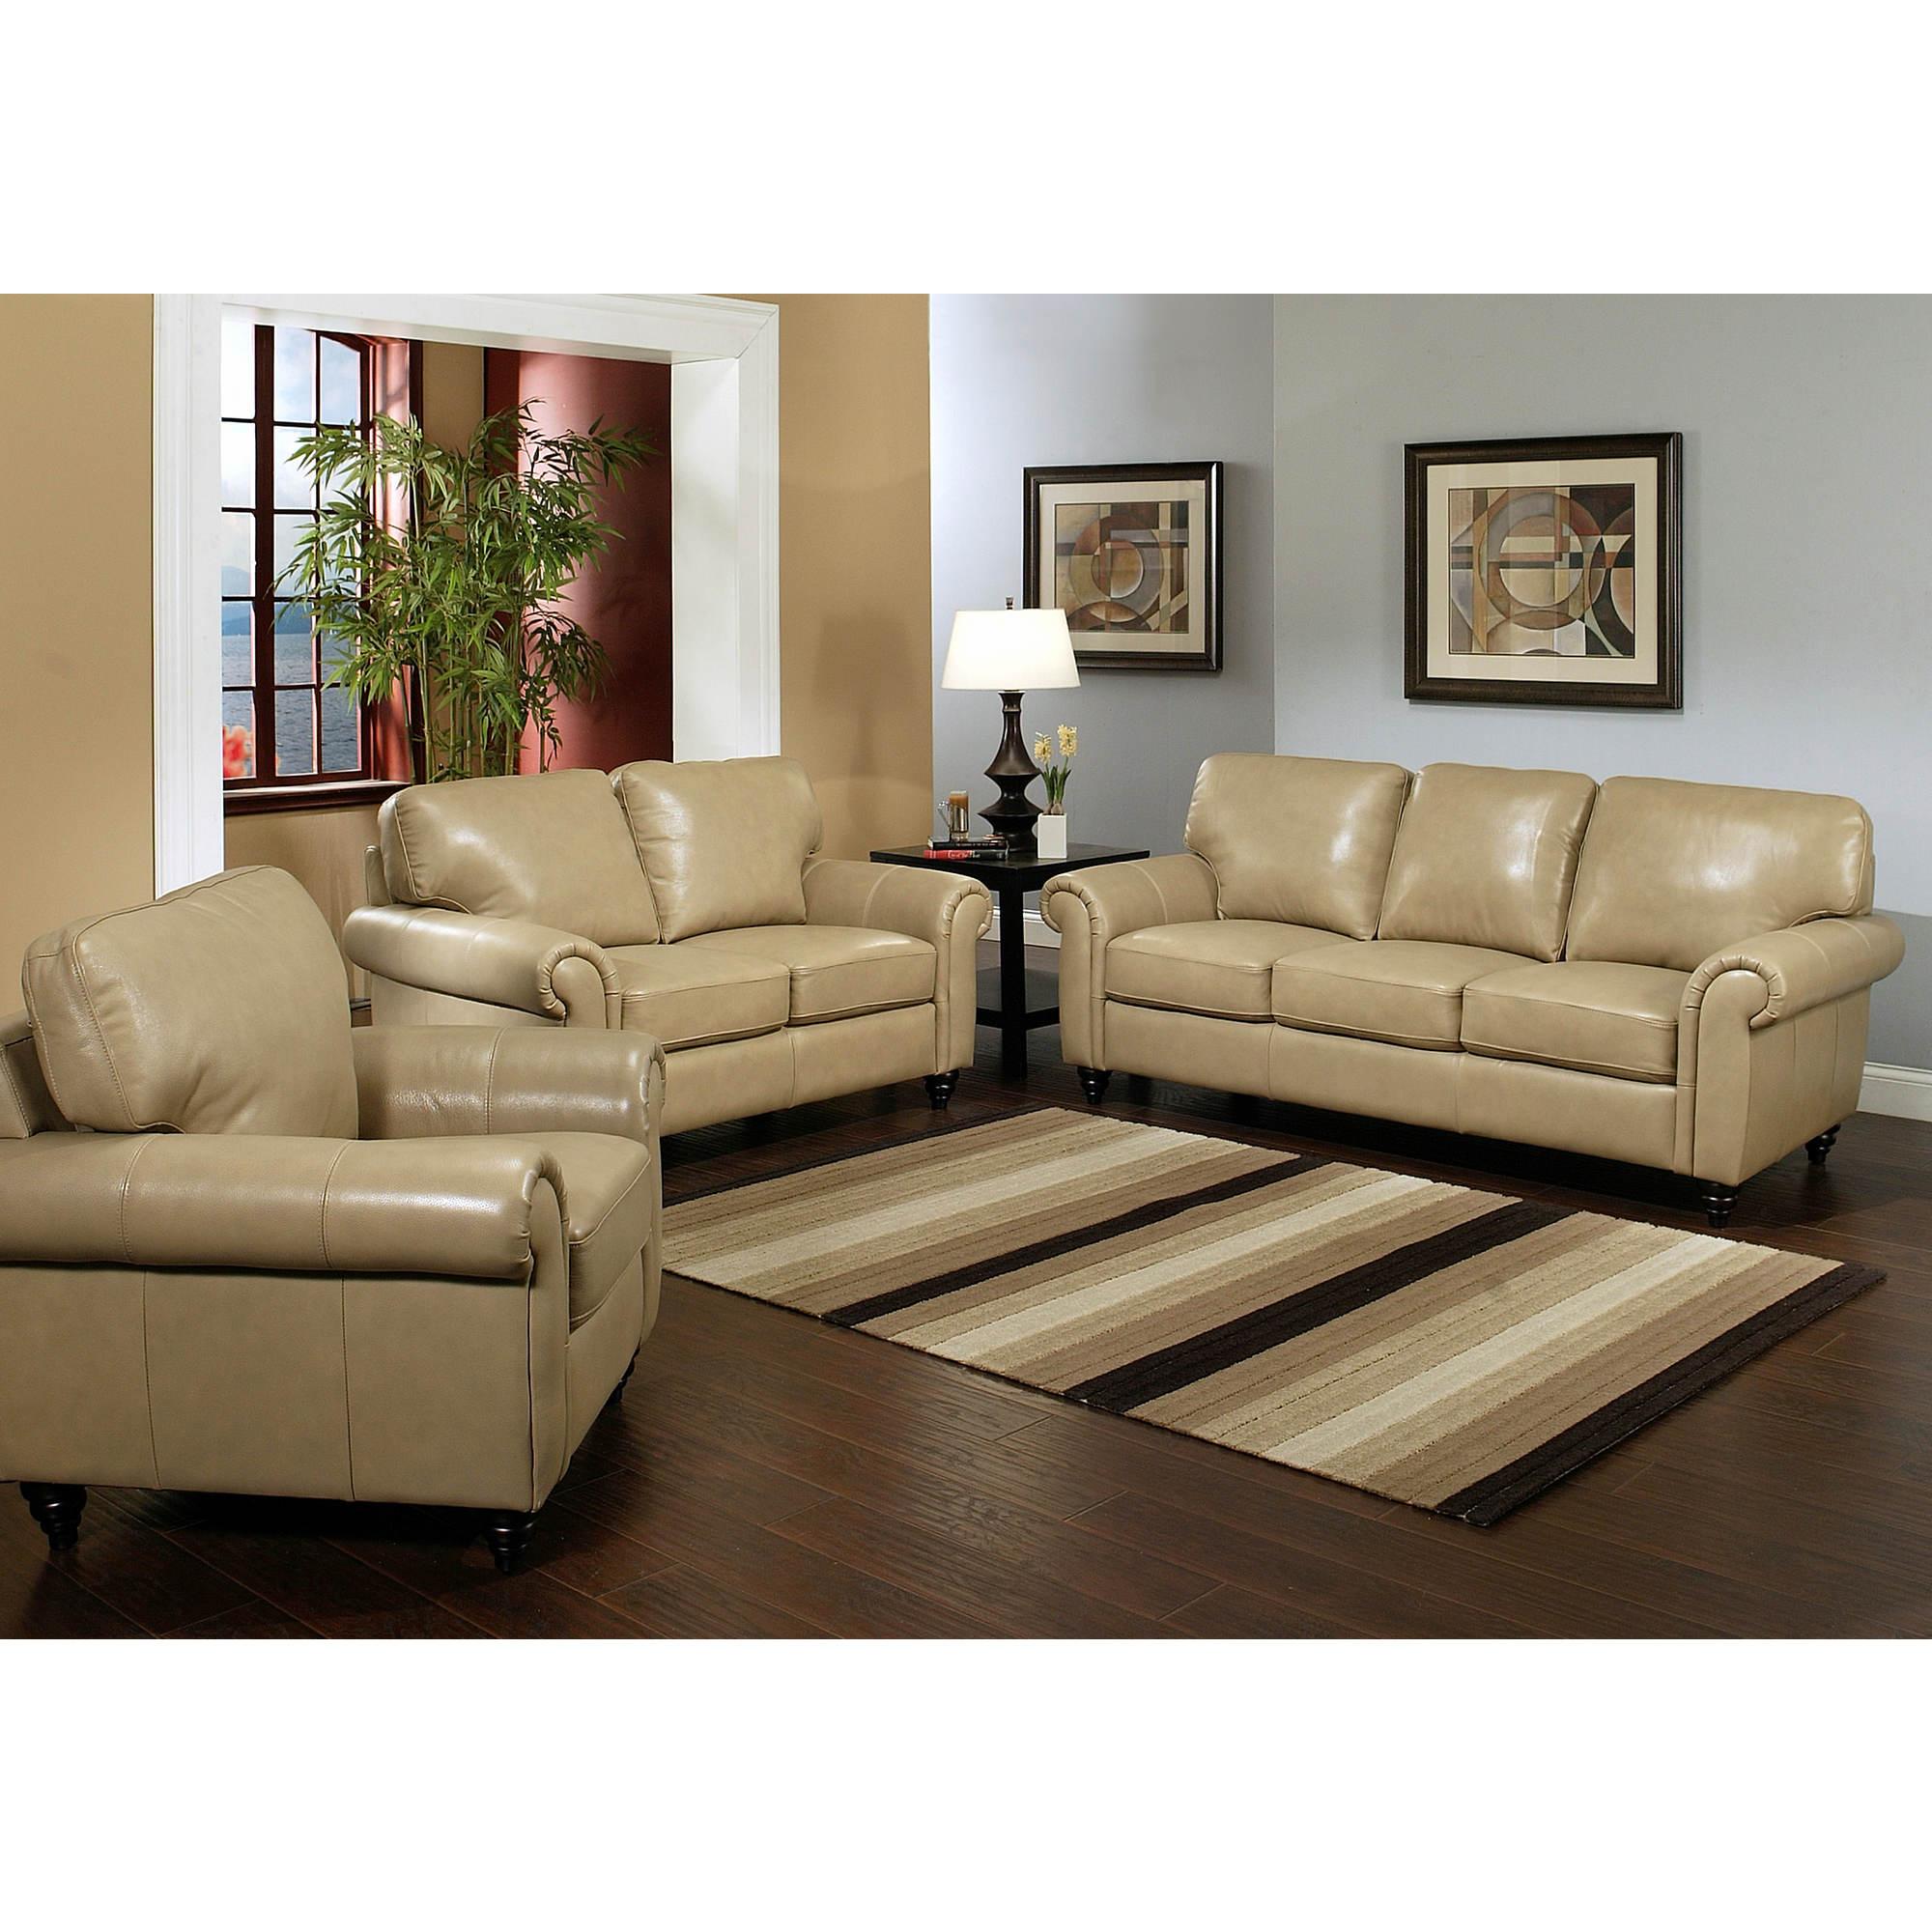 Top Grain Leather Living Room Set